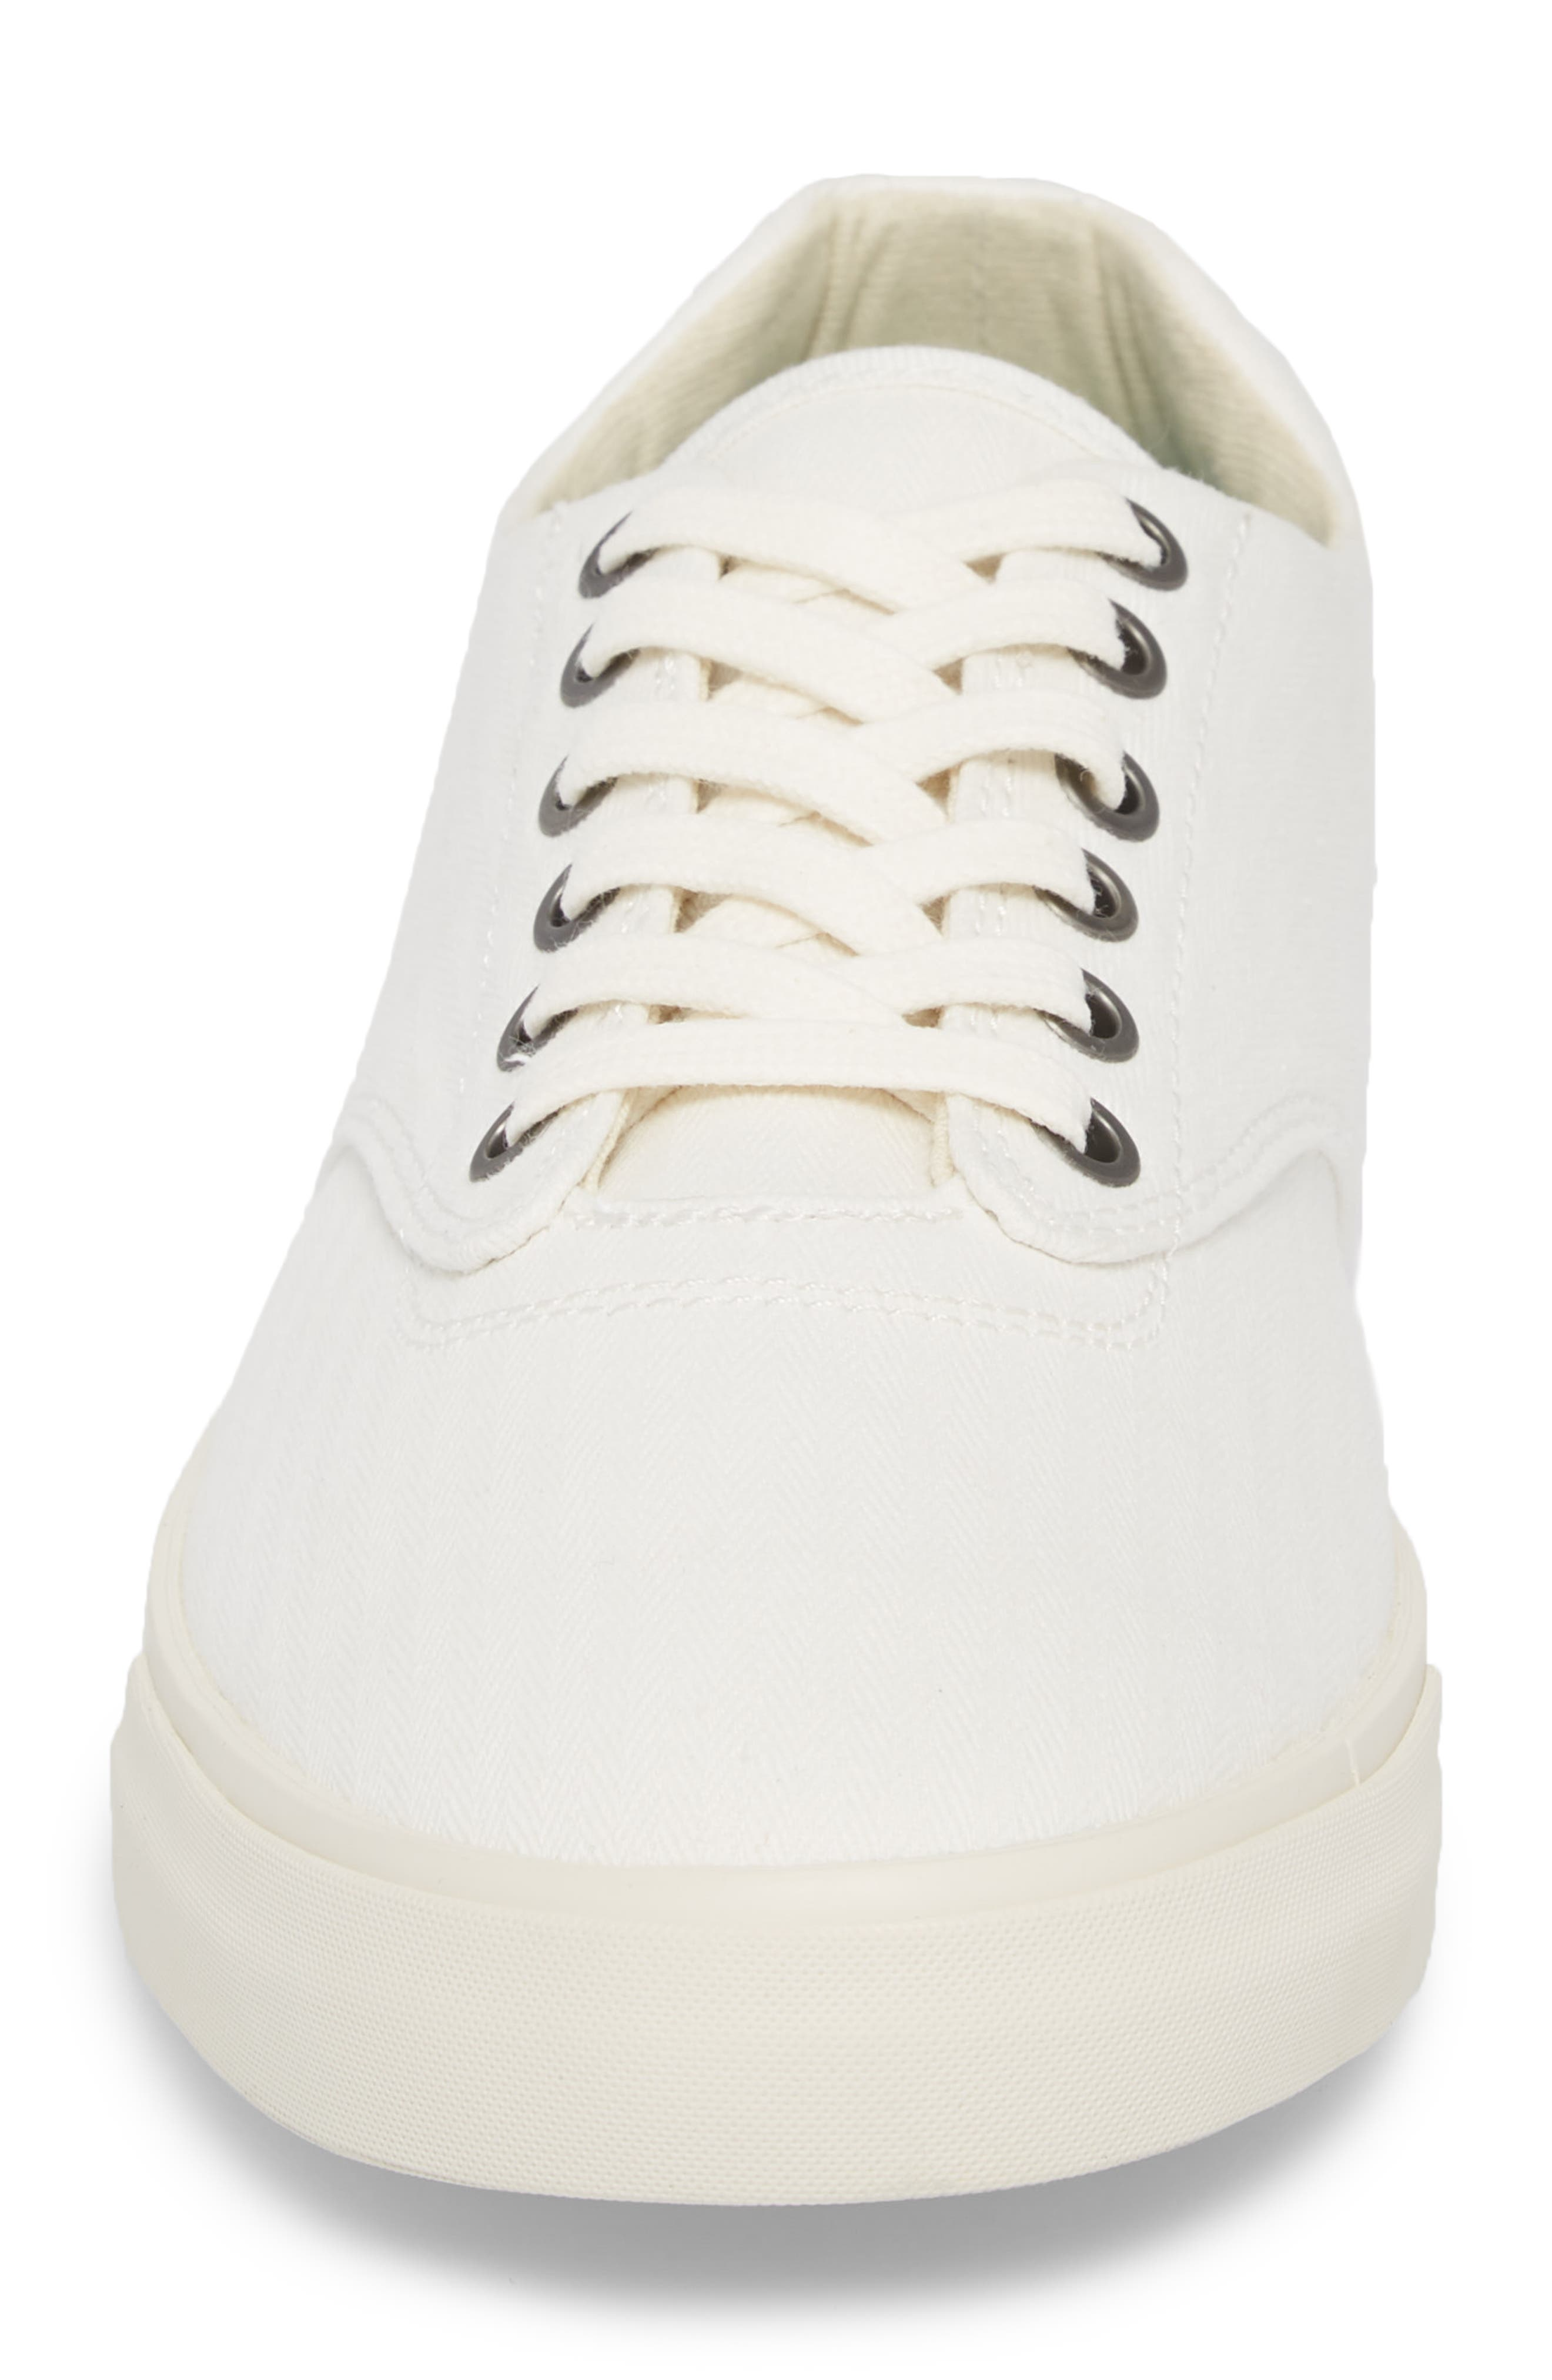 SEAVEES,                             Hermosa Plimsoll Sneaker,                             Alternate thumbnail 4, color,                             125